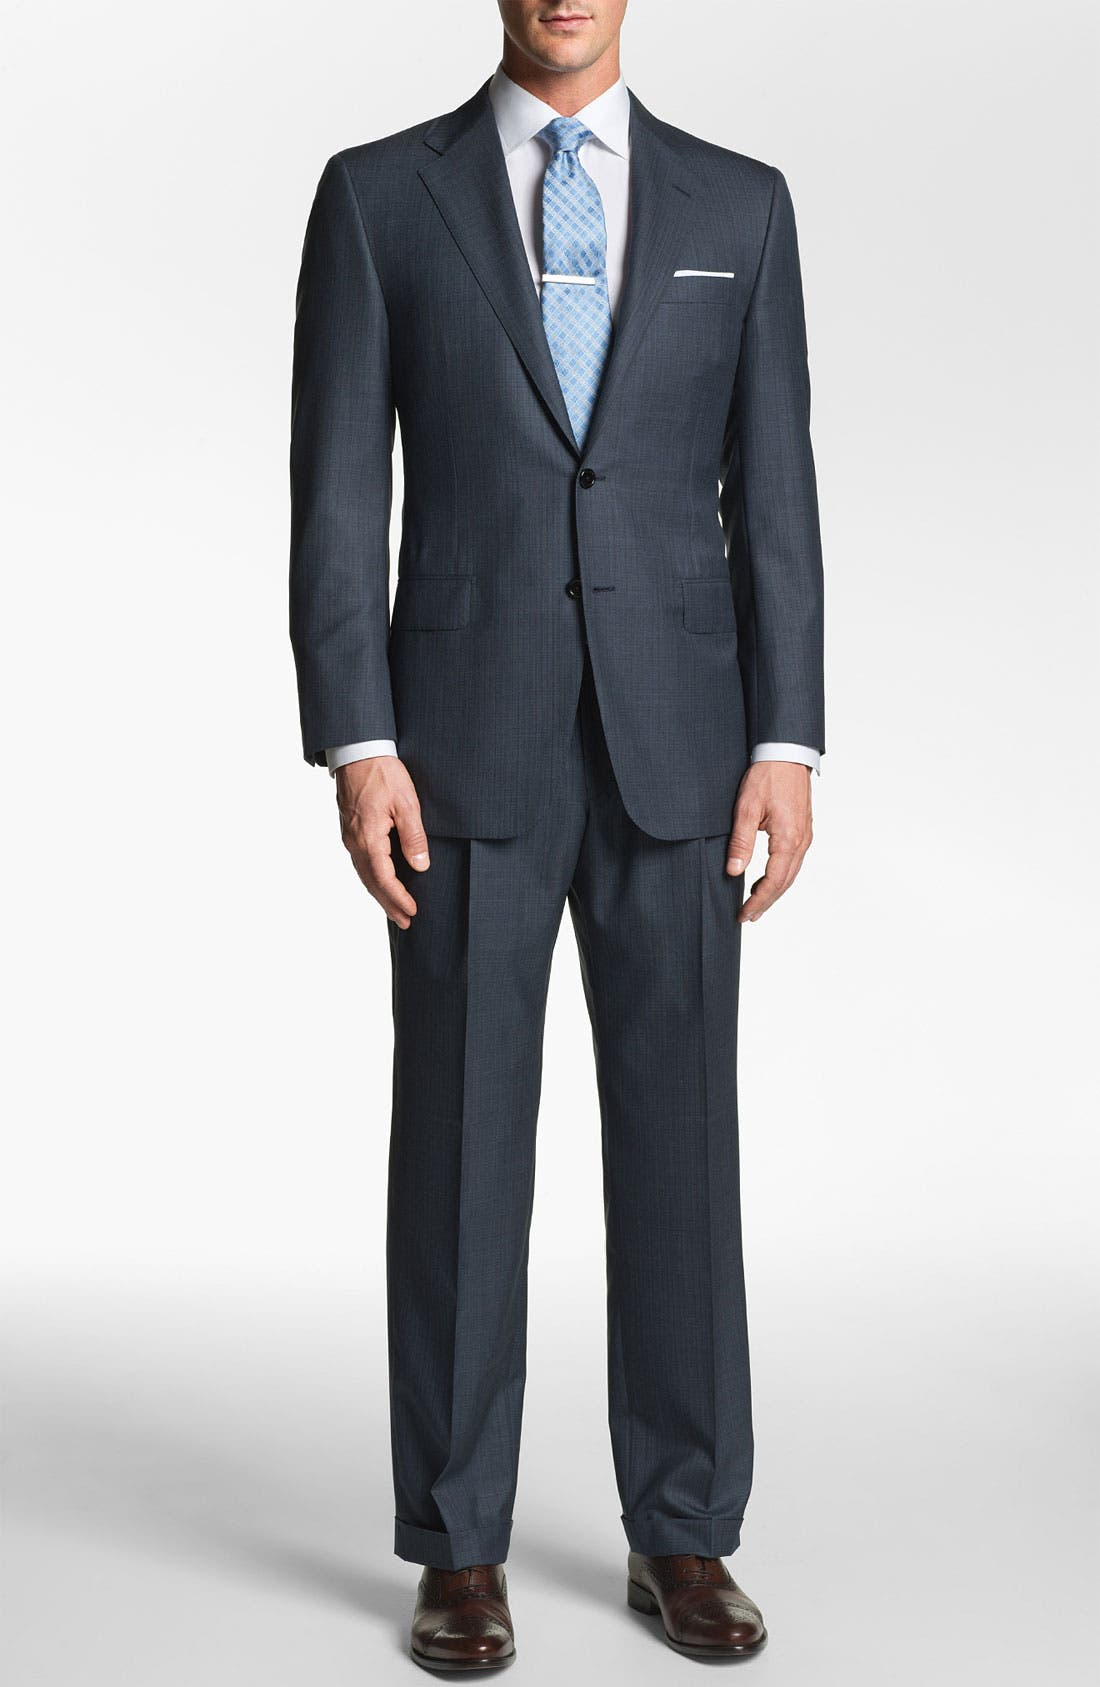 Main Image - Hickey Freeman 'Addison' Stripe Suit